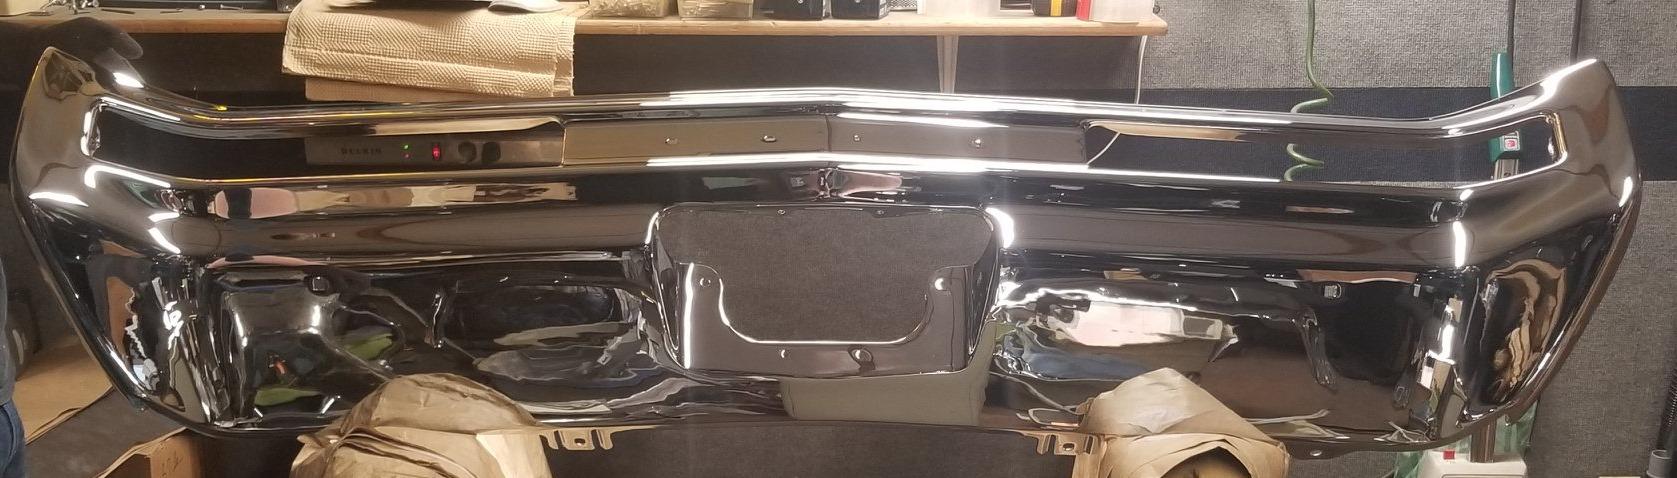 71 Buick GSX Bumper